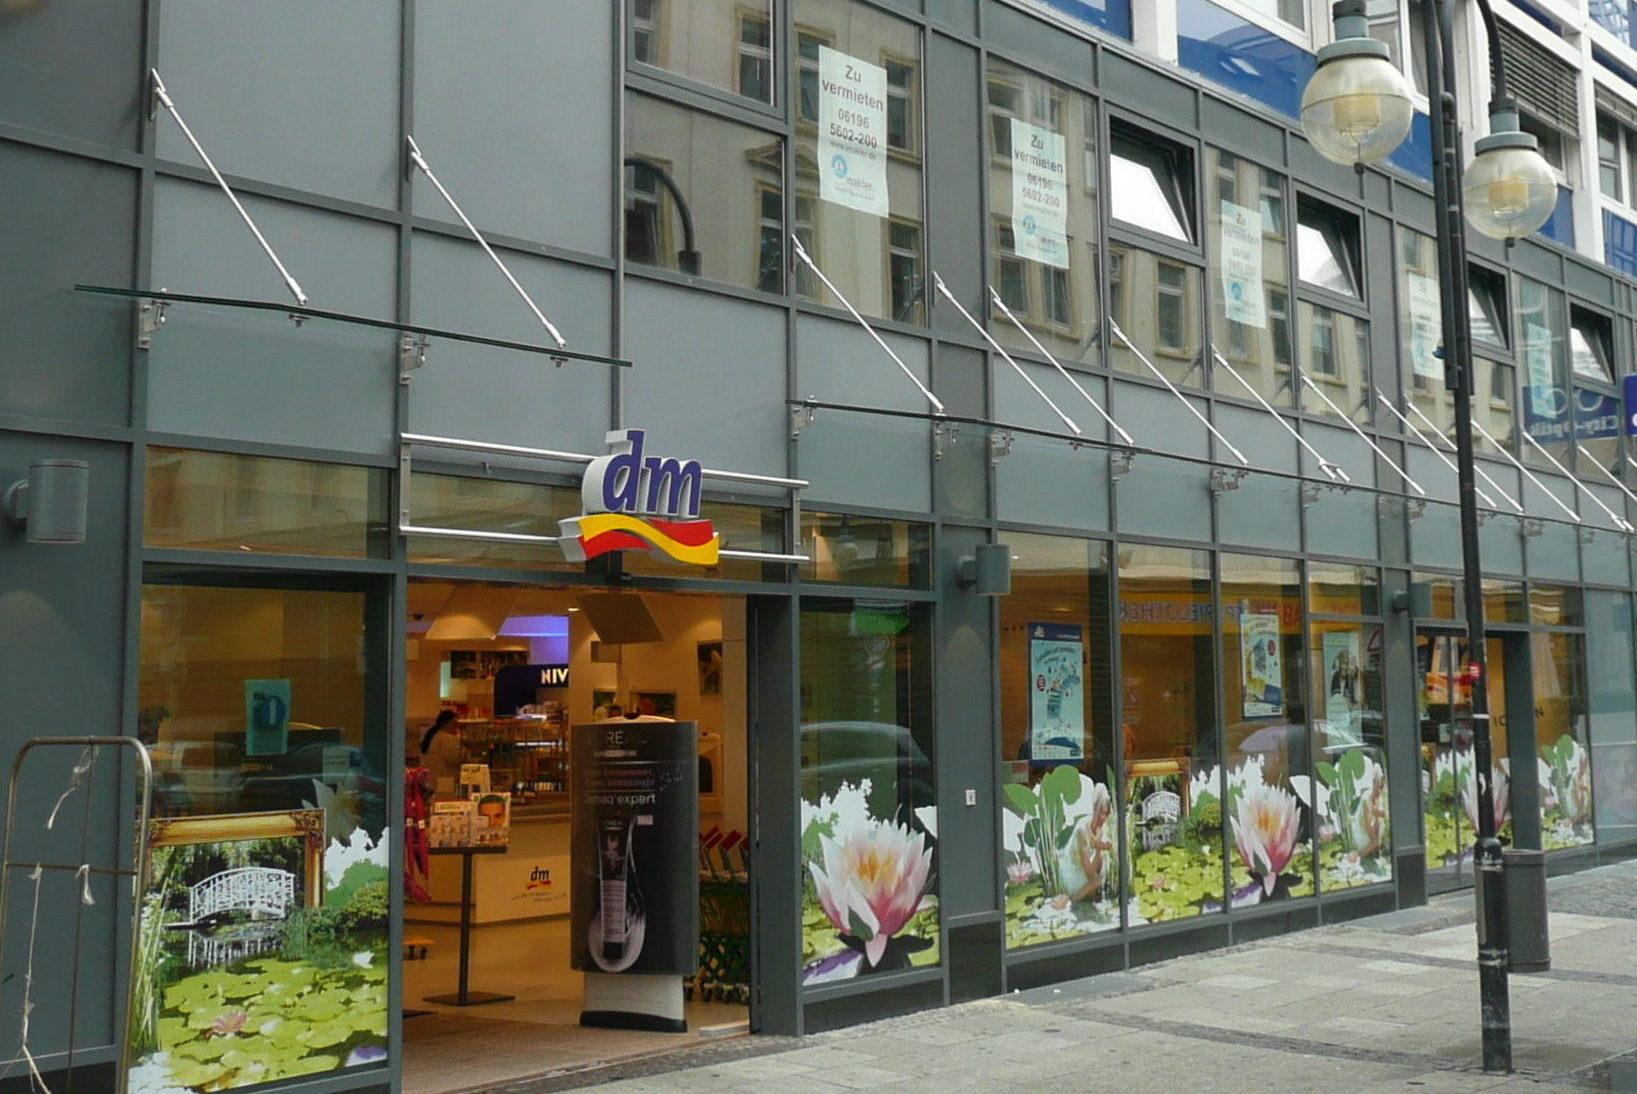 dm-Filiale, Frankfurt am Main